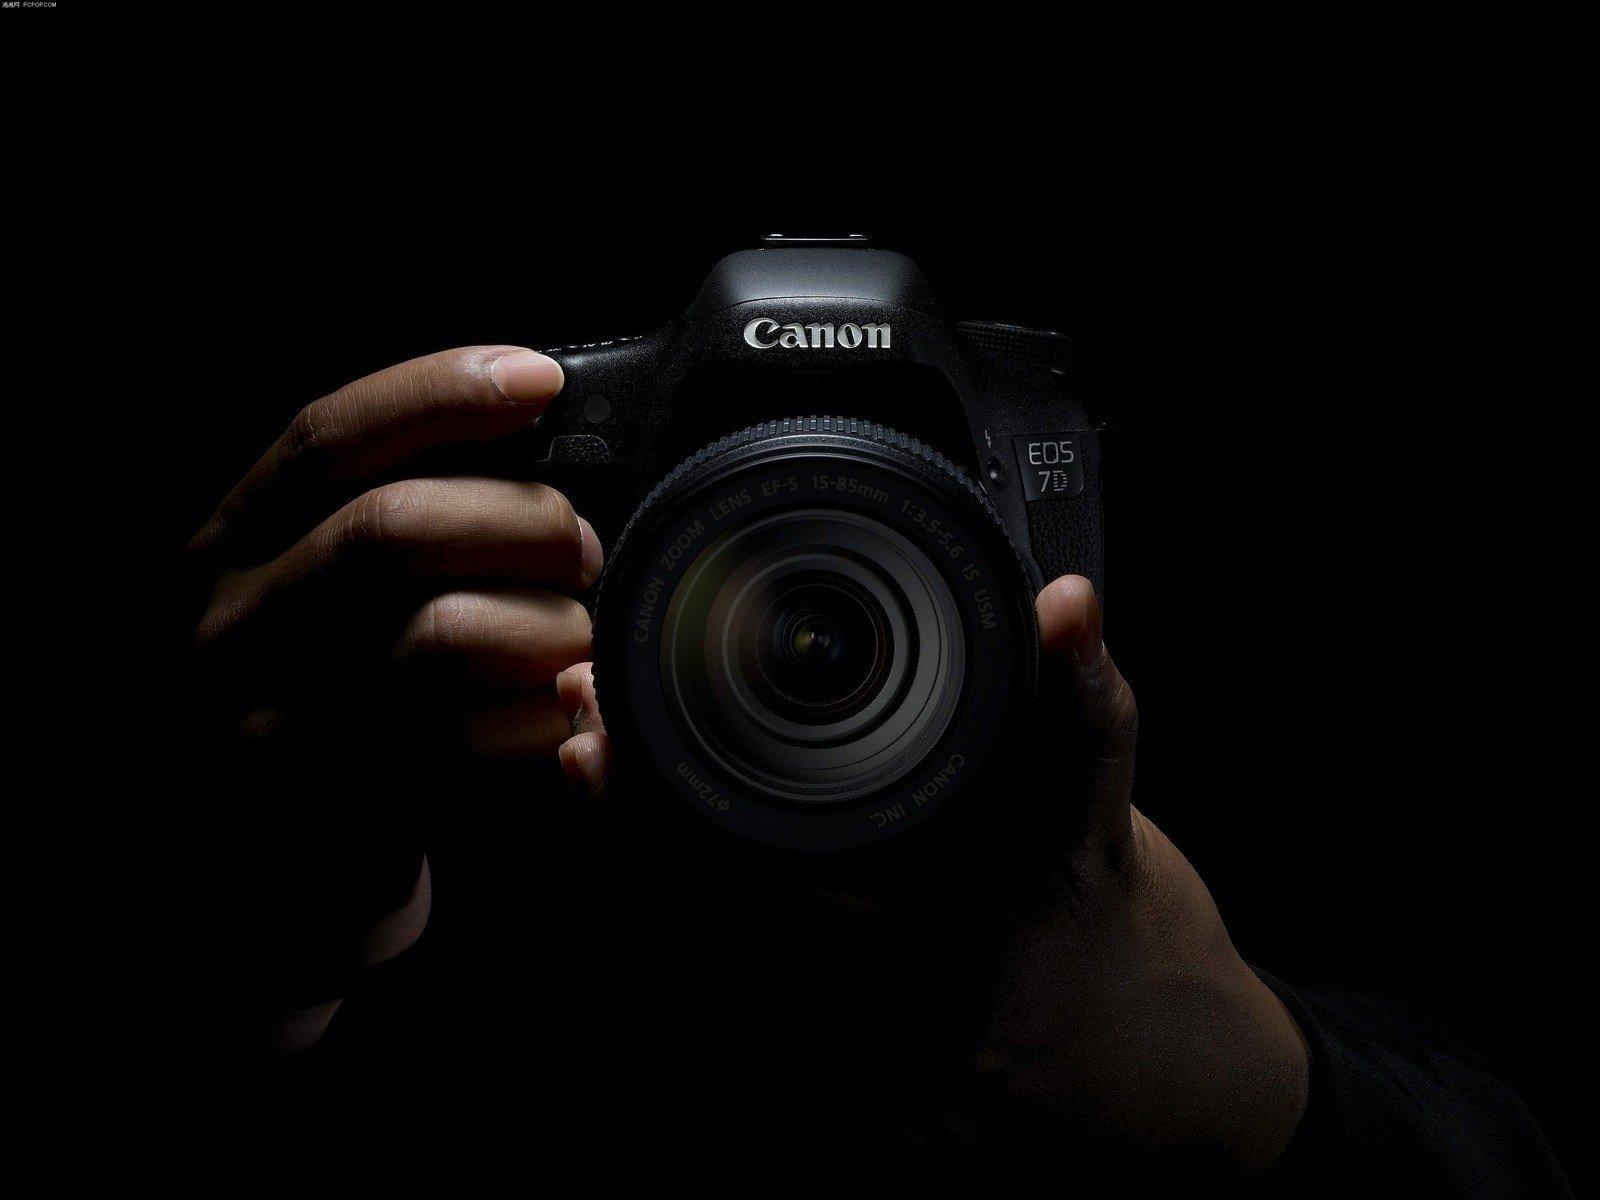 Appareil photo fond d 39 cran and arri re plan 1600x1200 for Ecran appareil photo